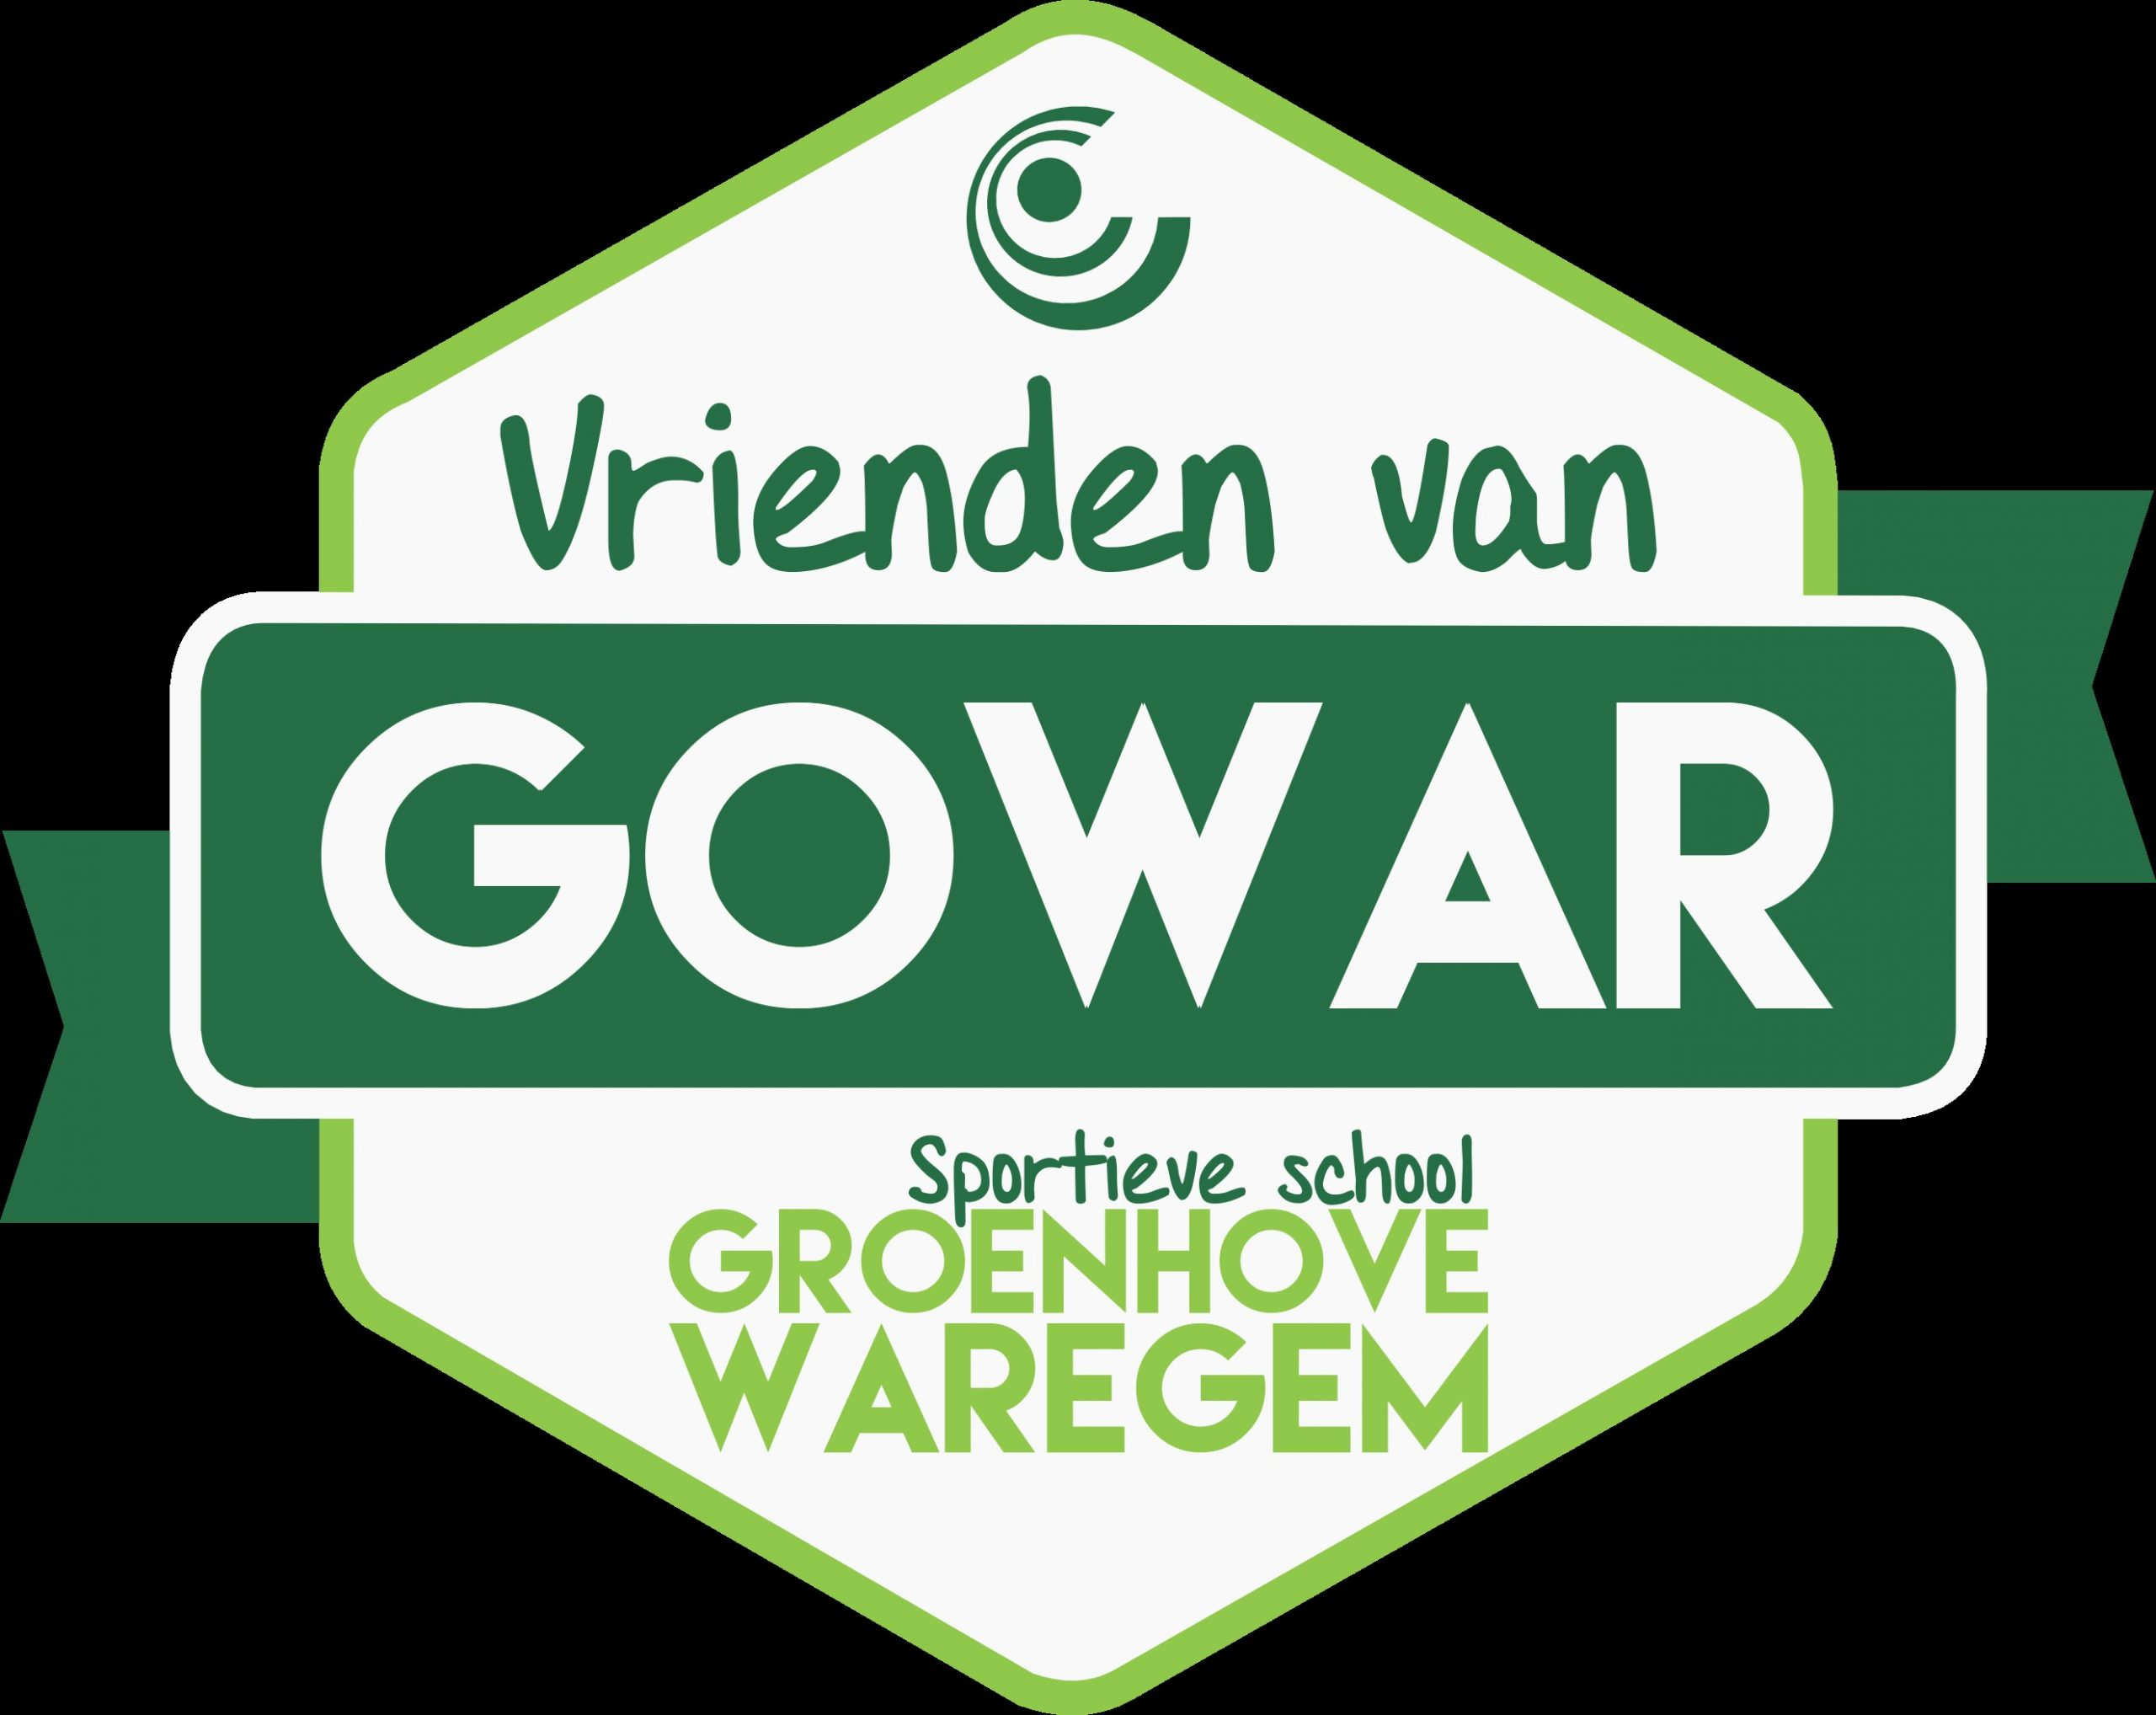 platina-gowar-vzw-groenhove-ms